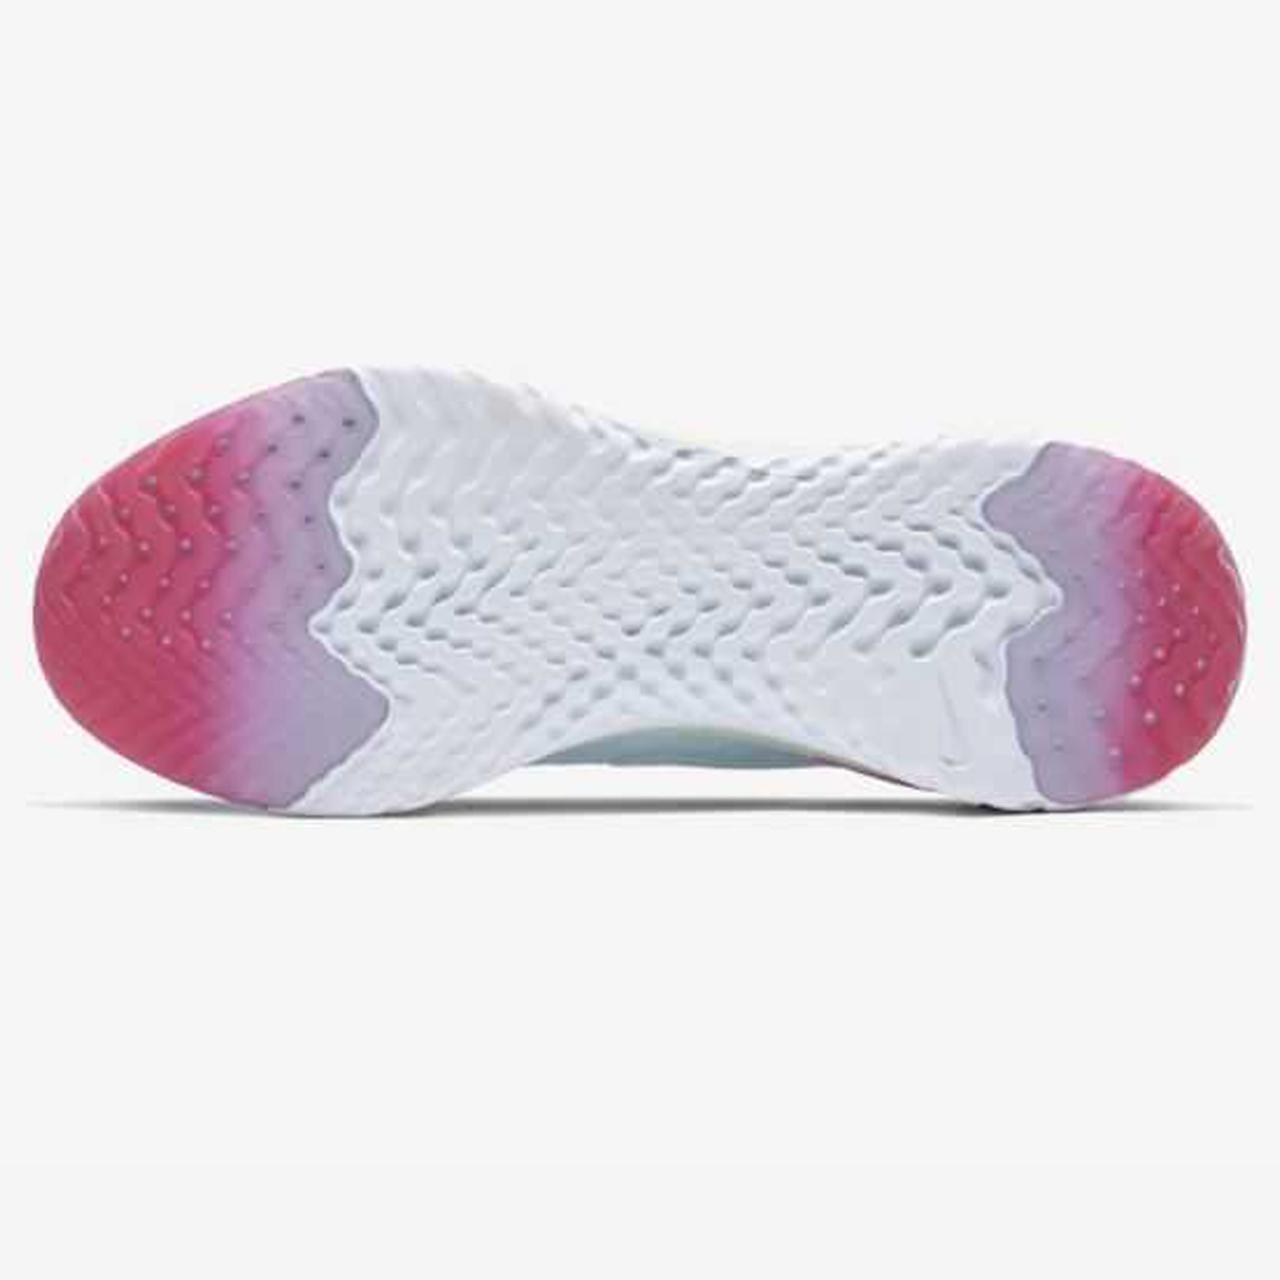 http://zarshoes.ir/uploadfile/file_portal/site_5571_web/file_portal_end/shop/انبار-قدس/product/کفش-ورزشی/نایک-اپیک-رکت-2-آبی/1.jpg